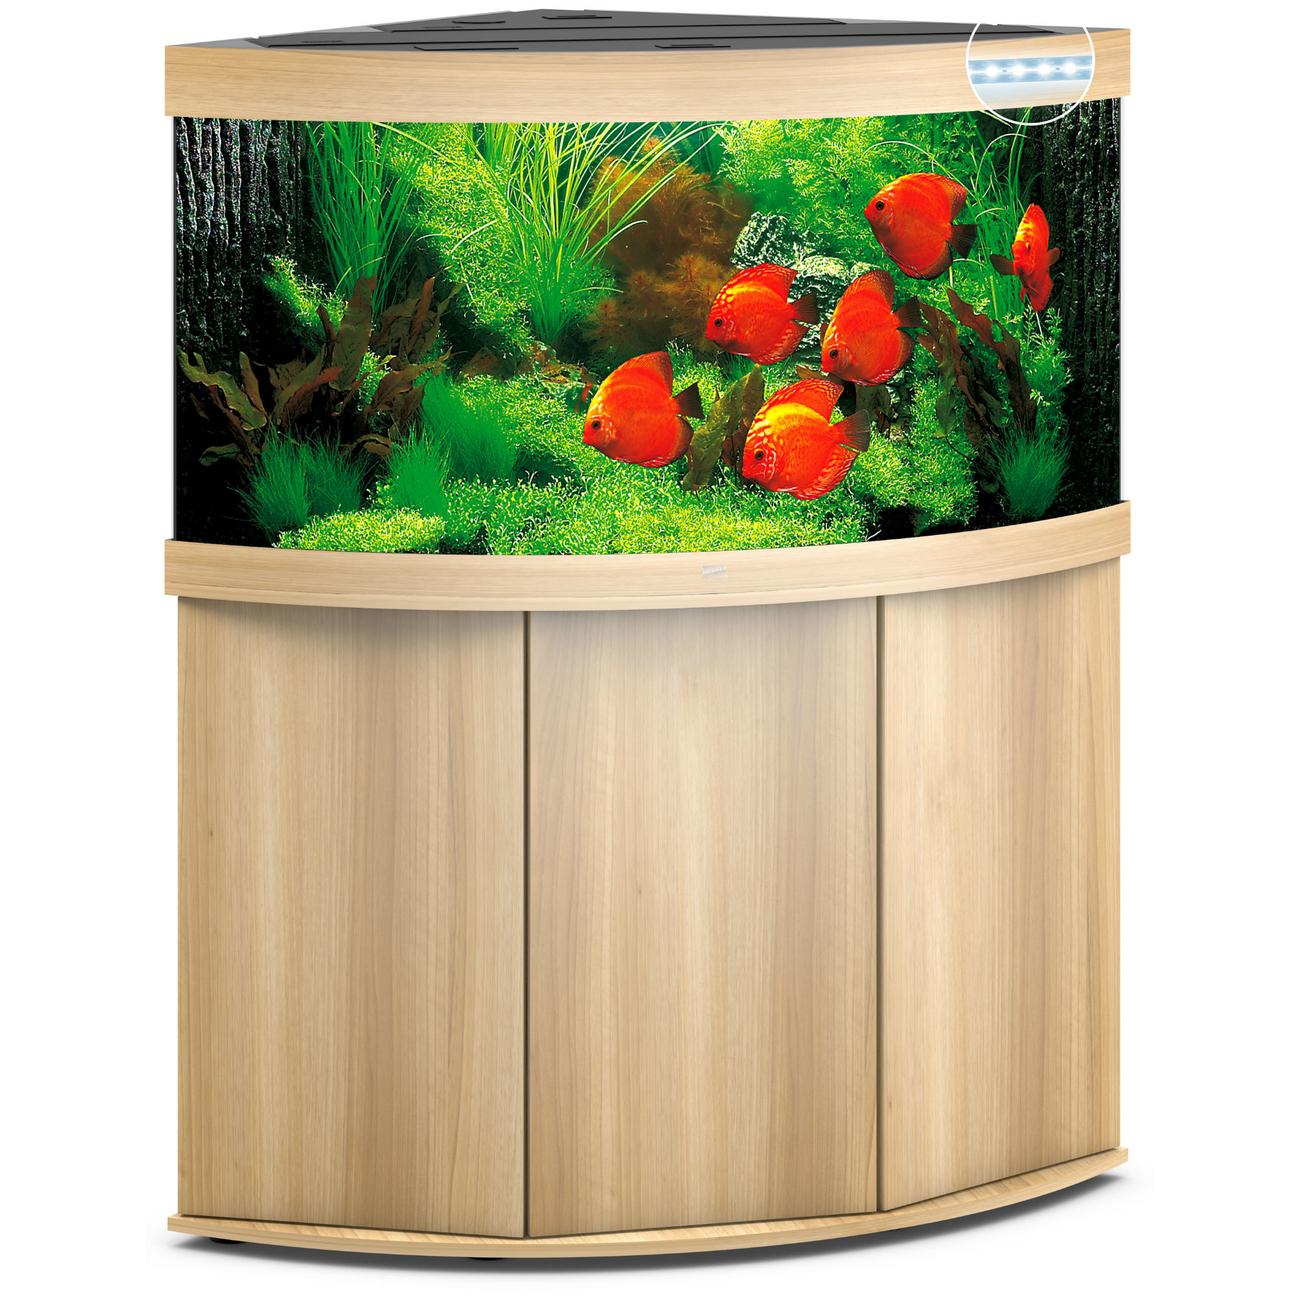 Juwel Trigon 350 LED Eck-Aquarium mit Unterschrank, Bild 11